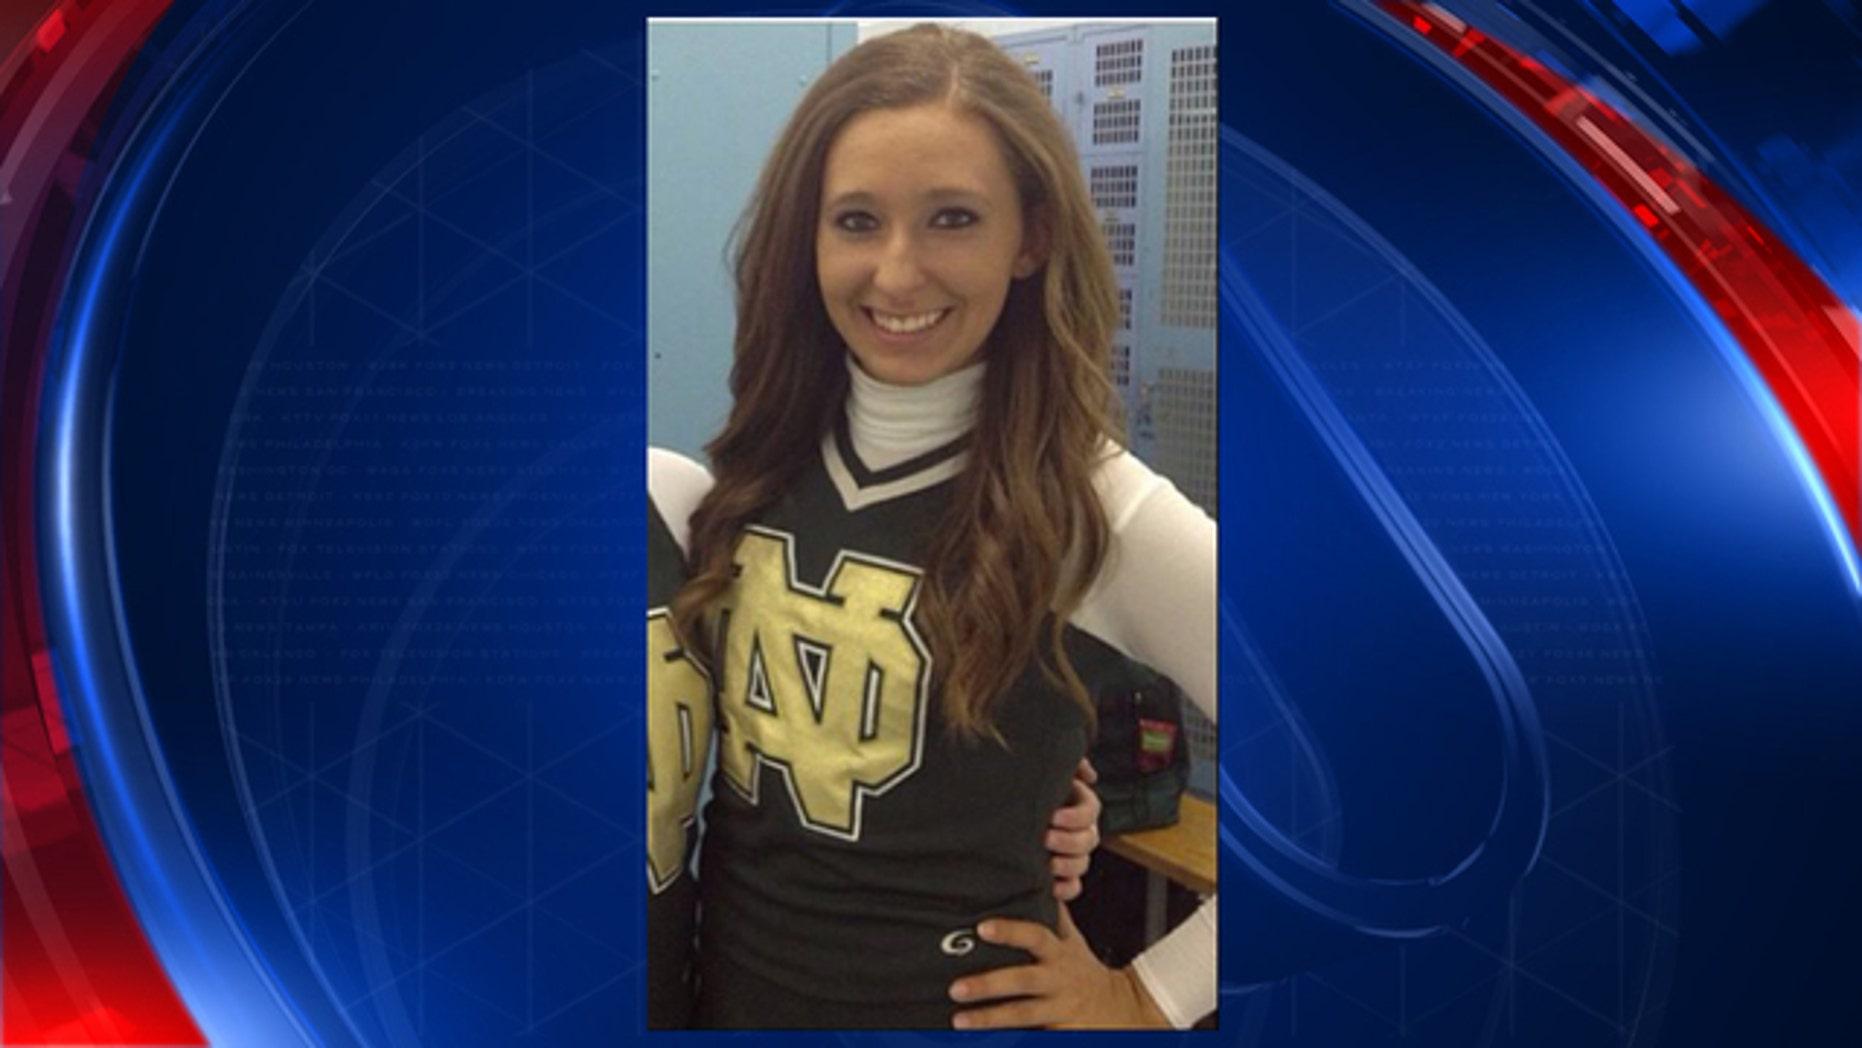 Fox 2 Detroit reported that the meningitis patient is Kristy Malter, 21.